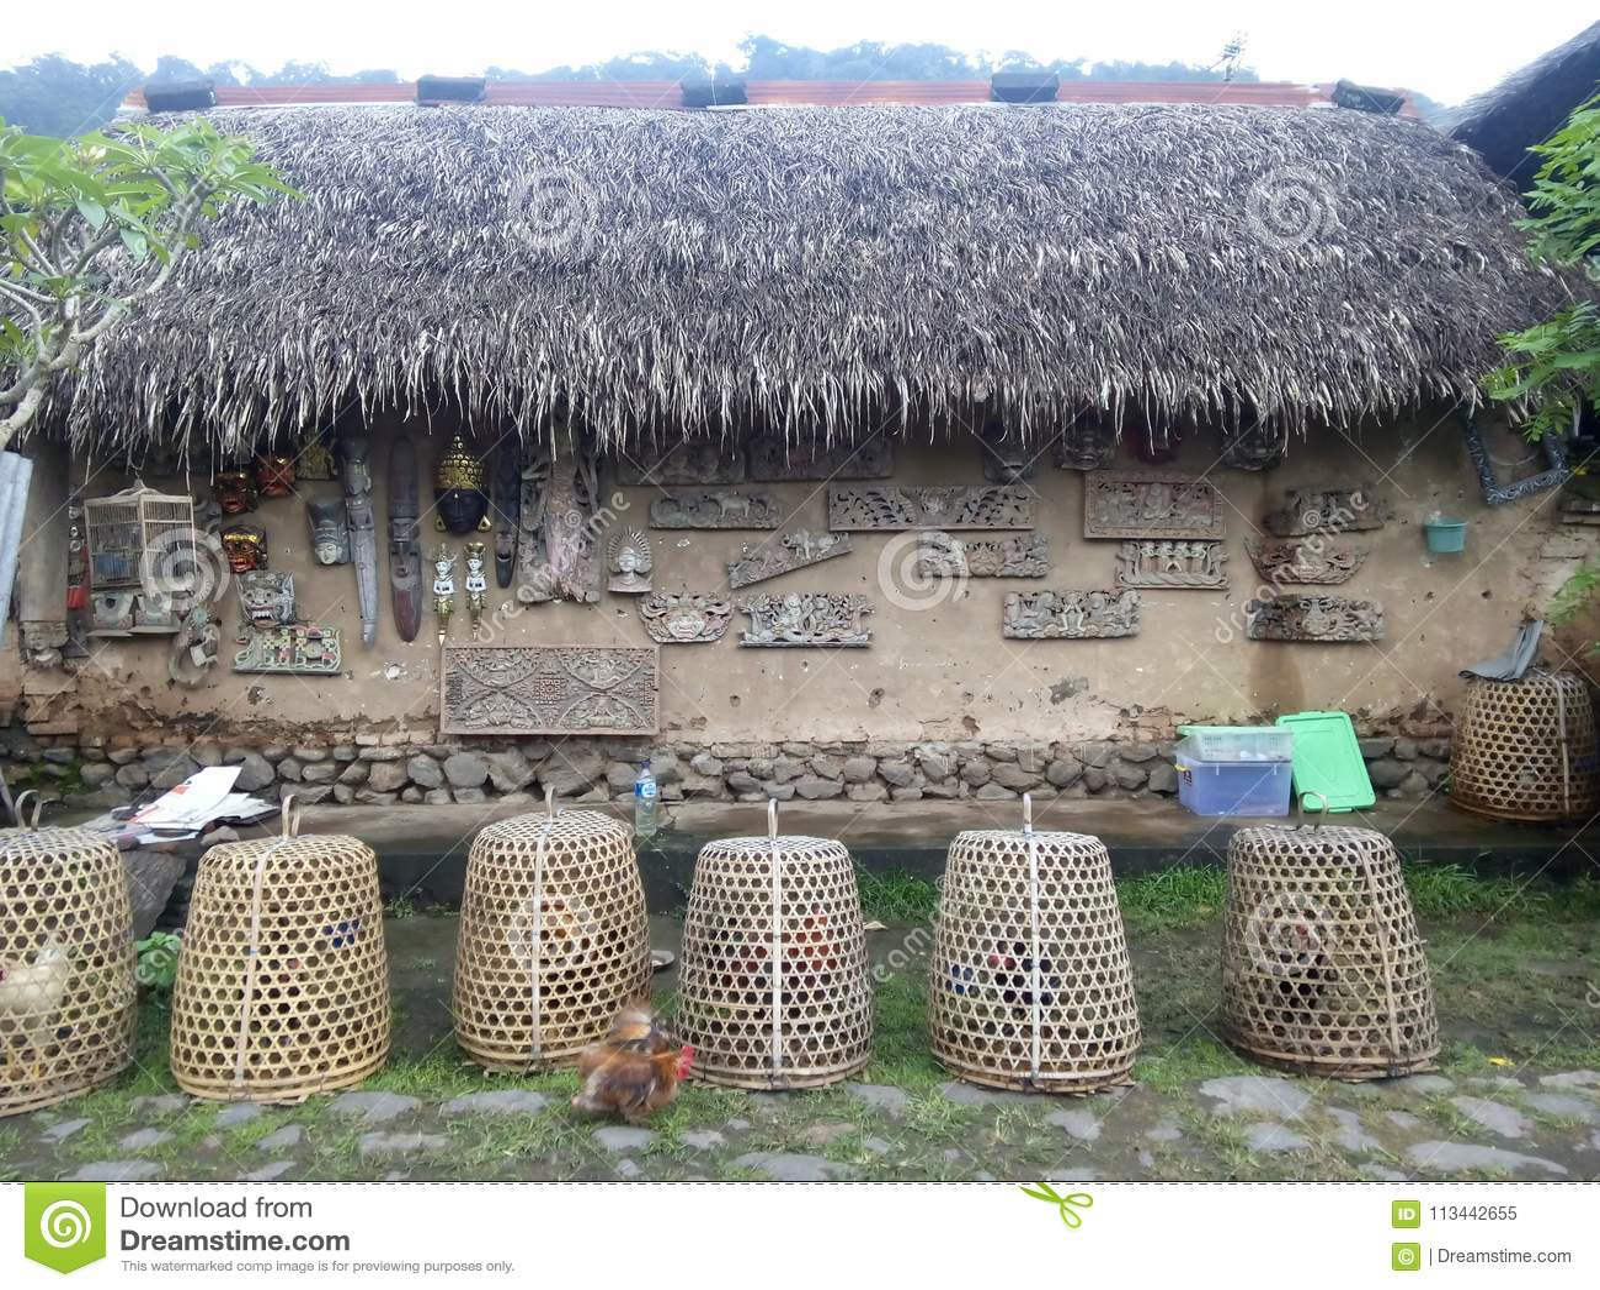 Bali Aga Village Stock Image Image Of Traditional Village 113442655